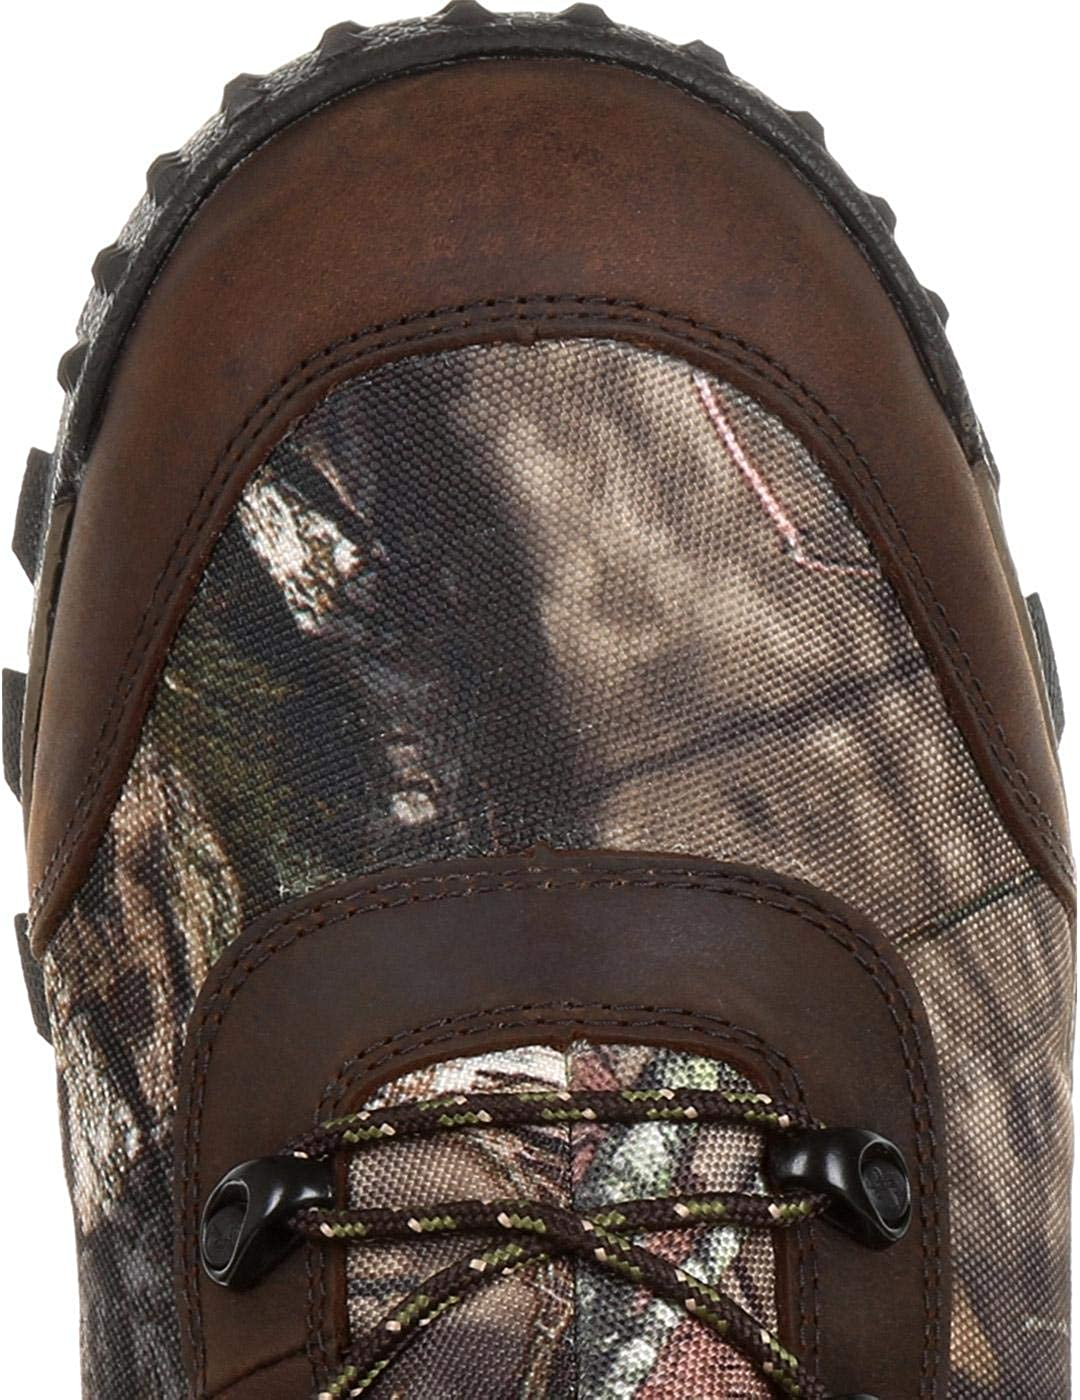 Rocky Sport Pro Timber Stalker 800G Insulated Waterproof Outdoor Boot